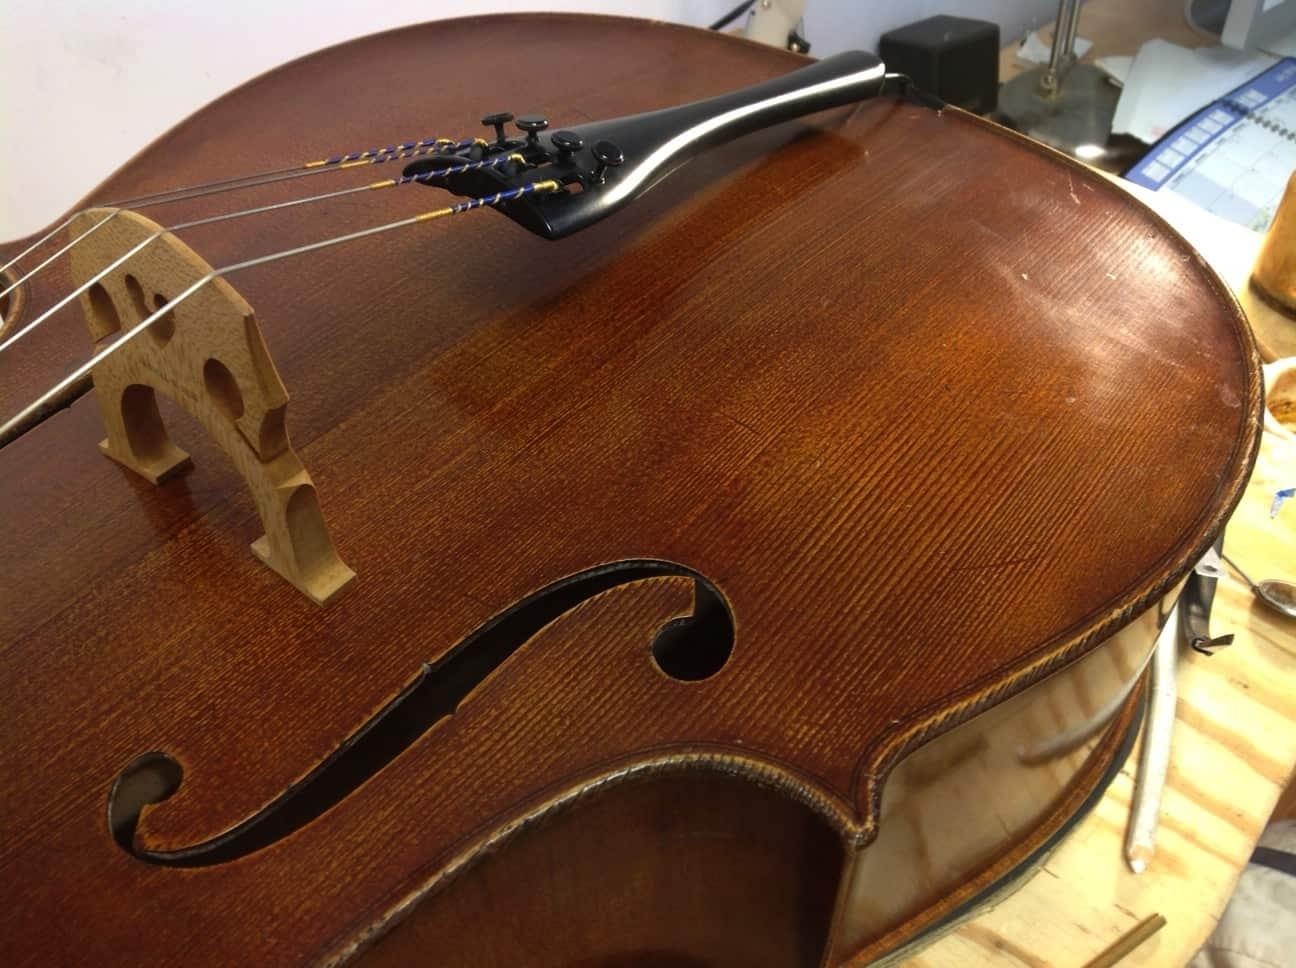 A beautiful instrument